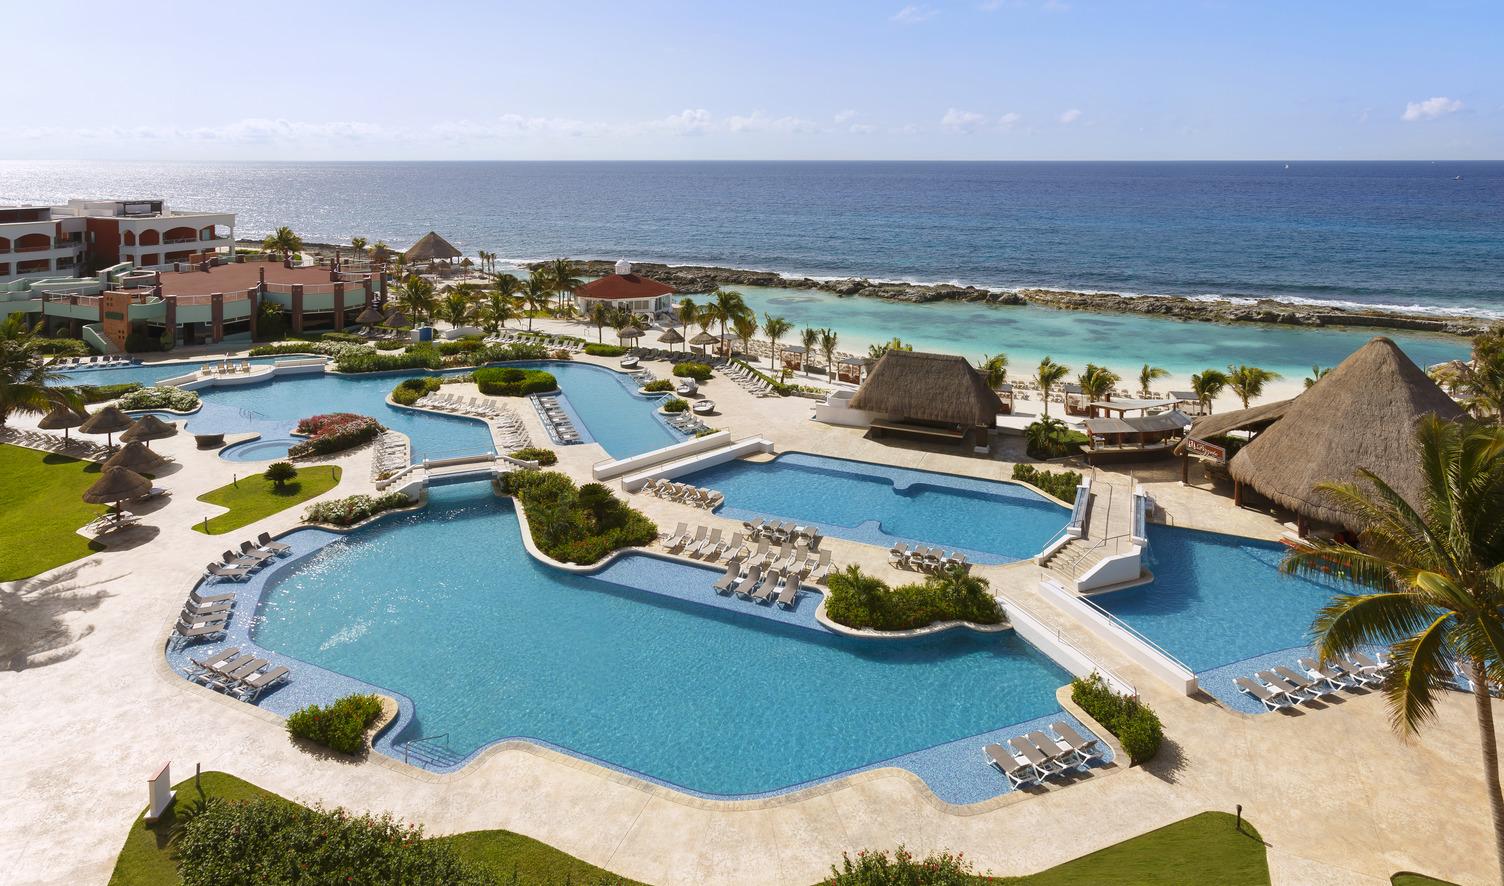 Travel Agency All-Inclusive Resort Heaven at Hard Rock Hotel Riviera Maya 03